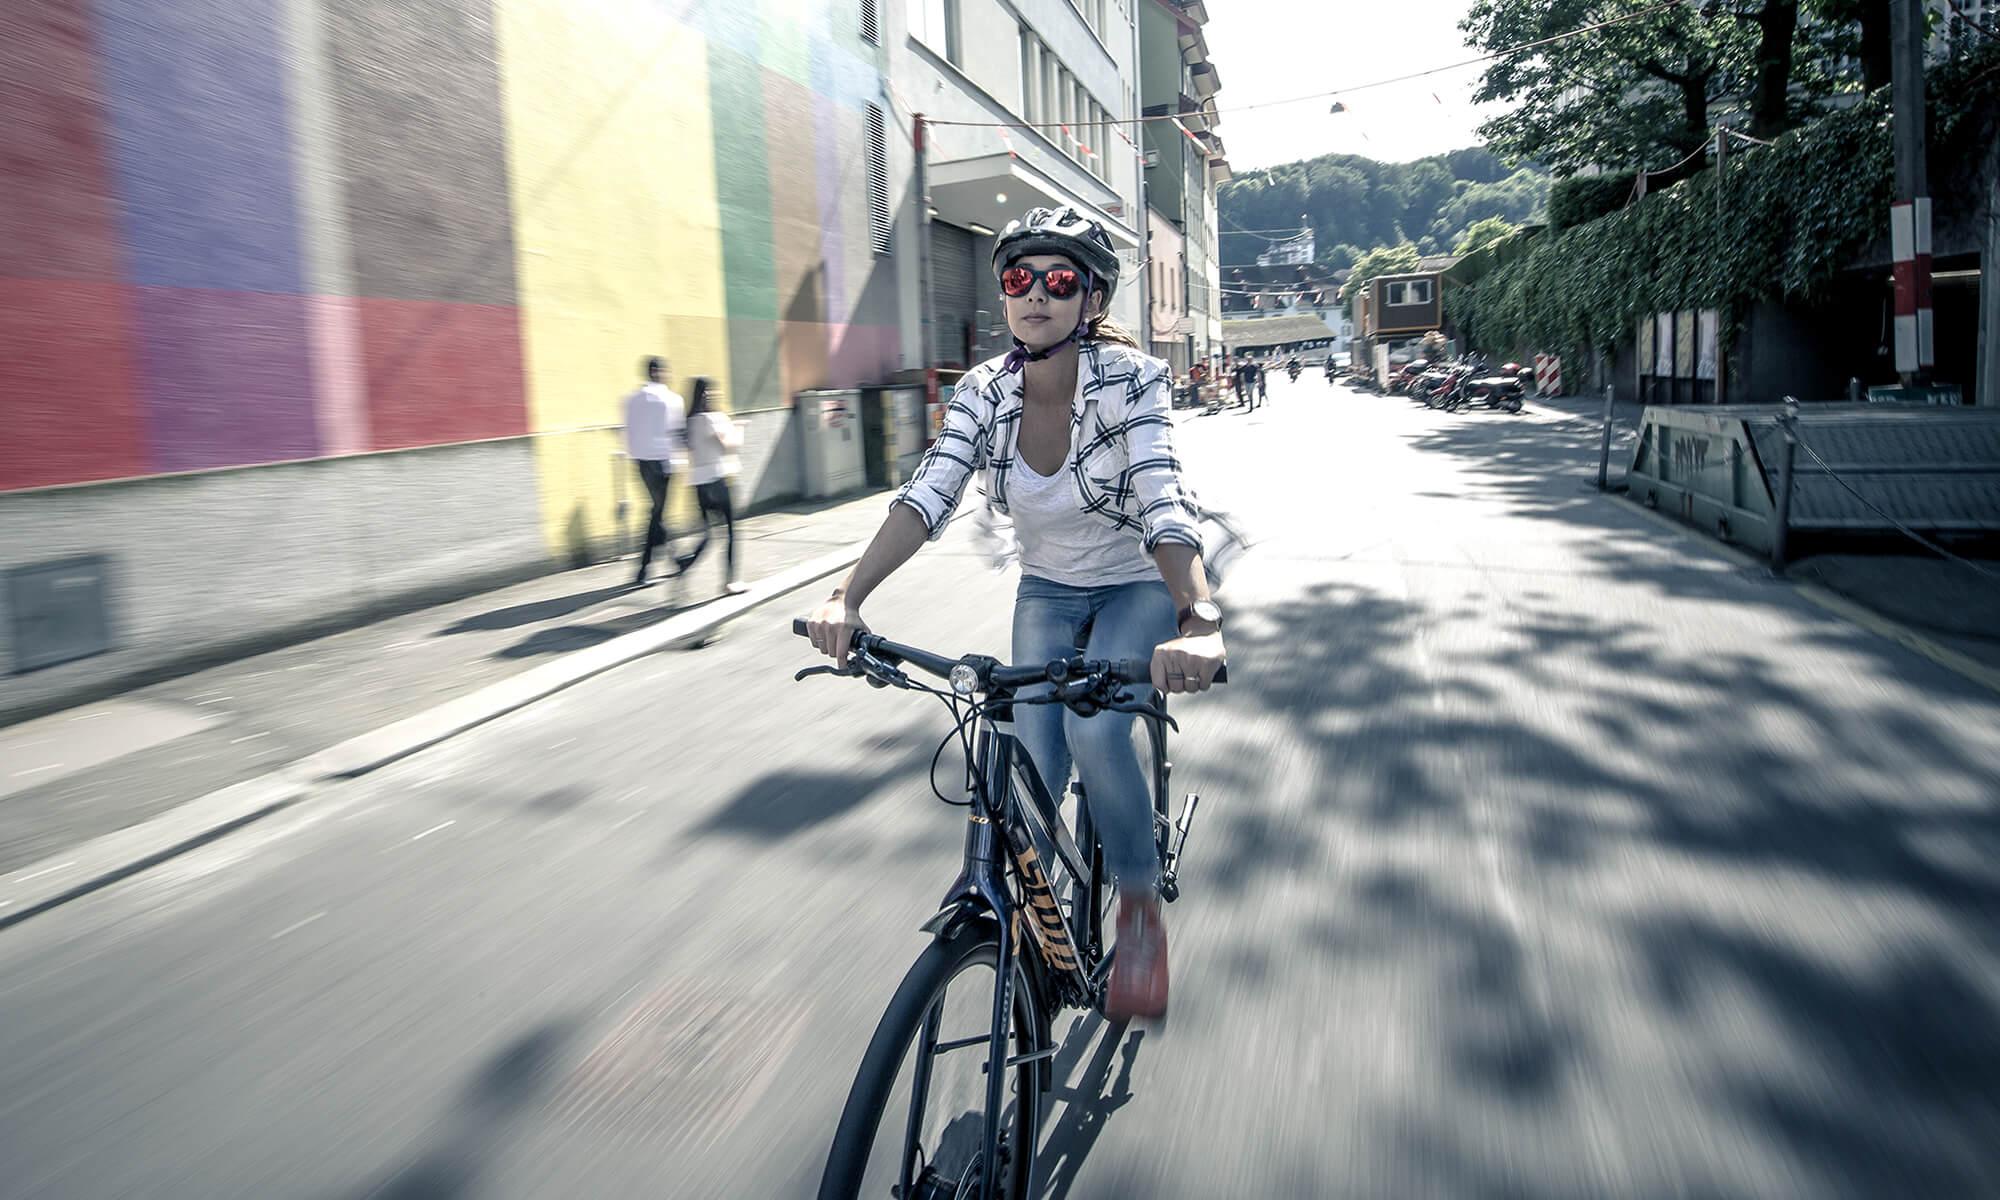 Velolounge: City-Bike